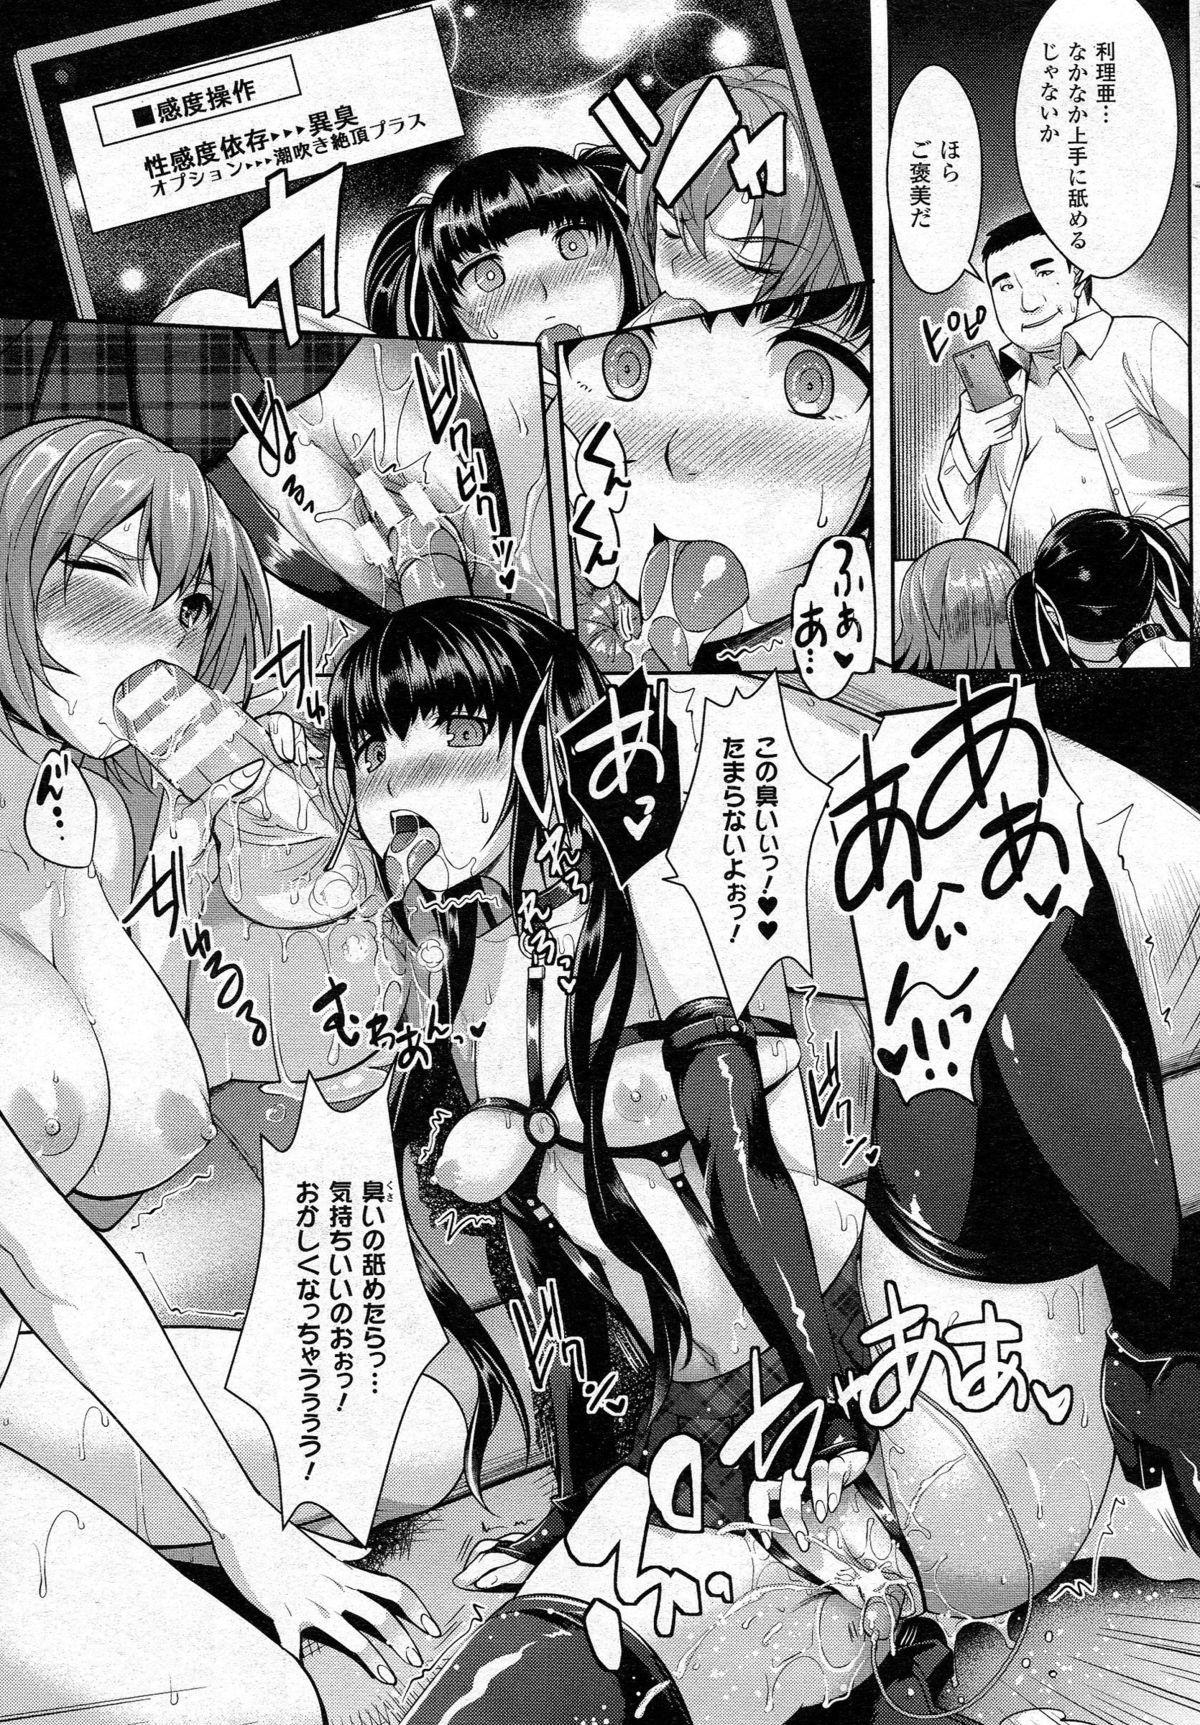 COMIC Unreal 2015-06 Vol. 55 + Hisasi Illust Shuu 245